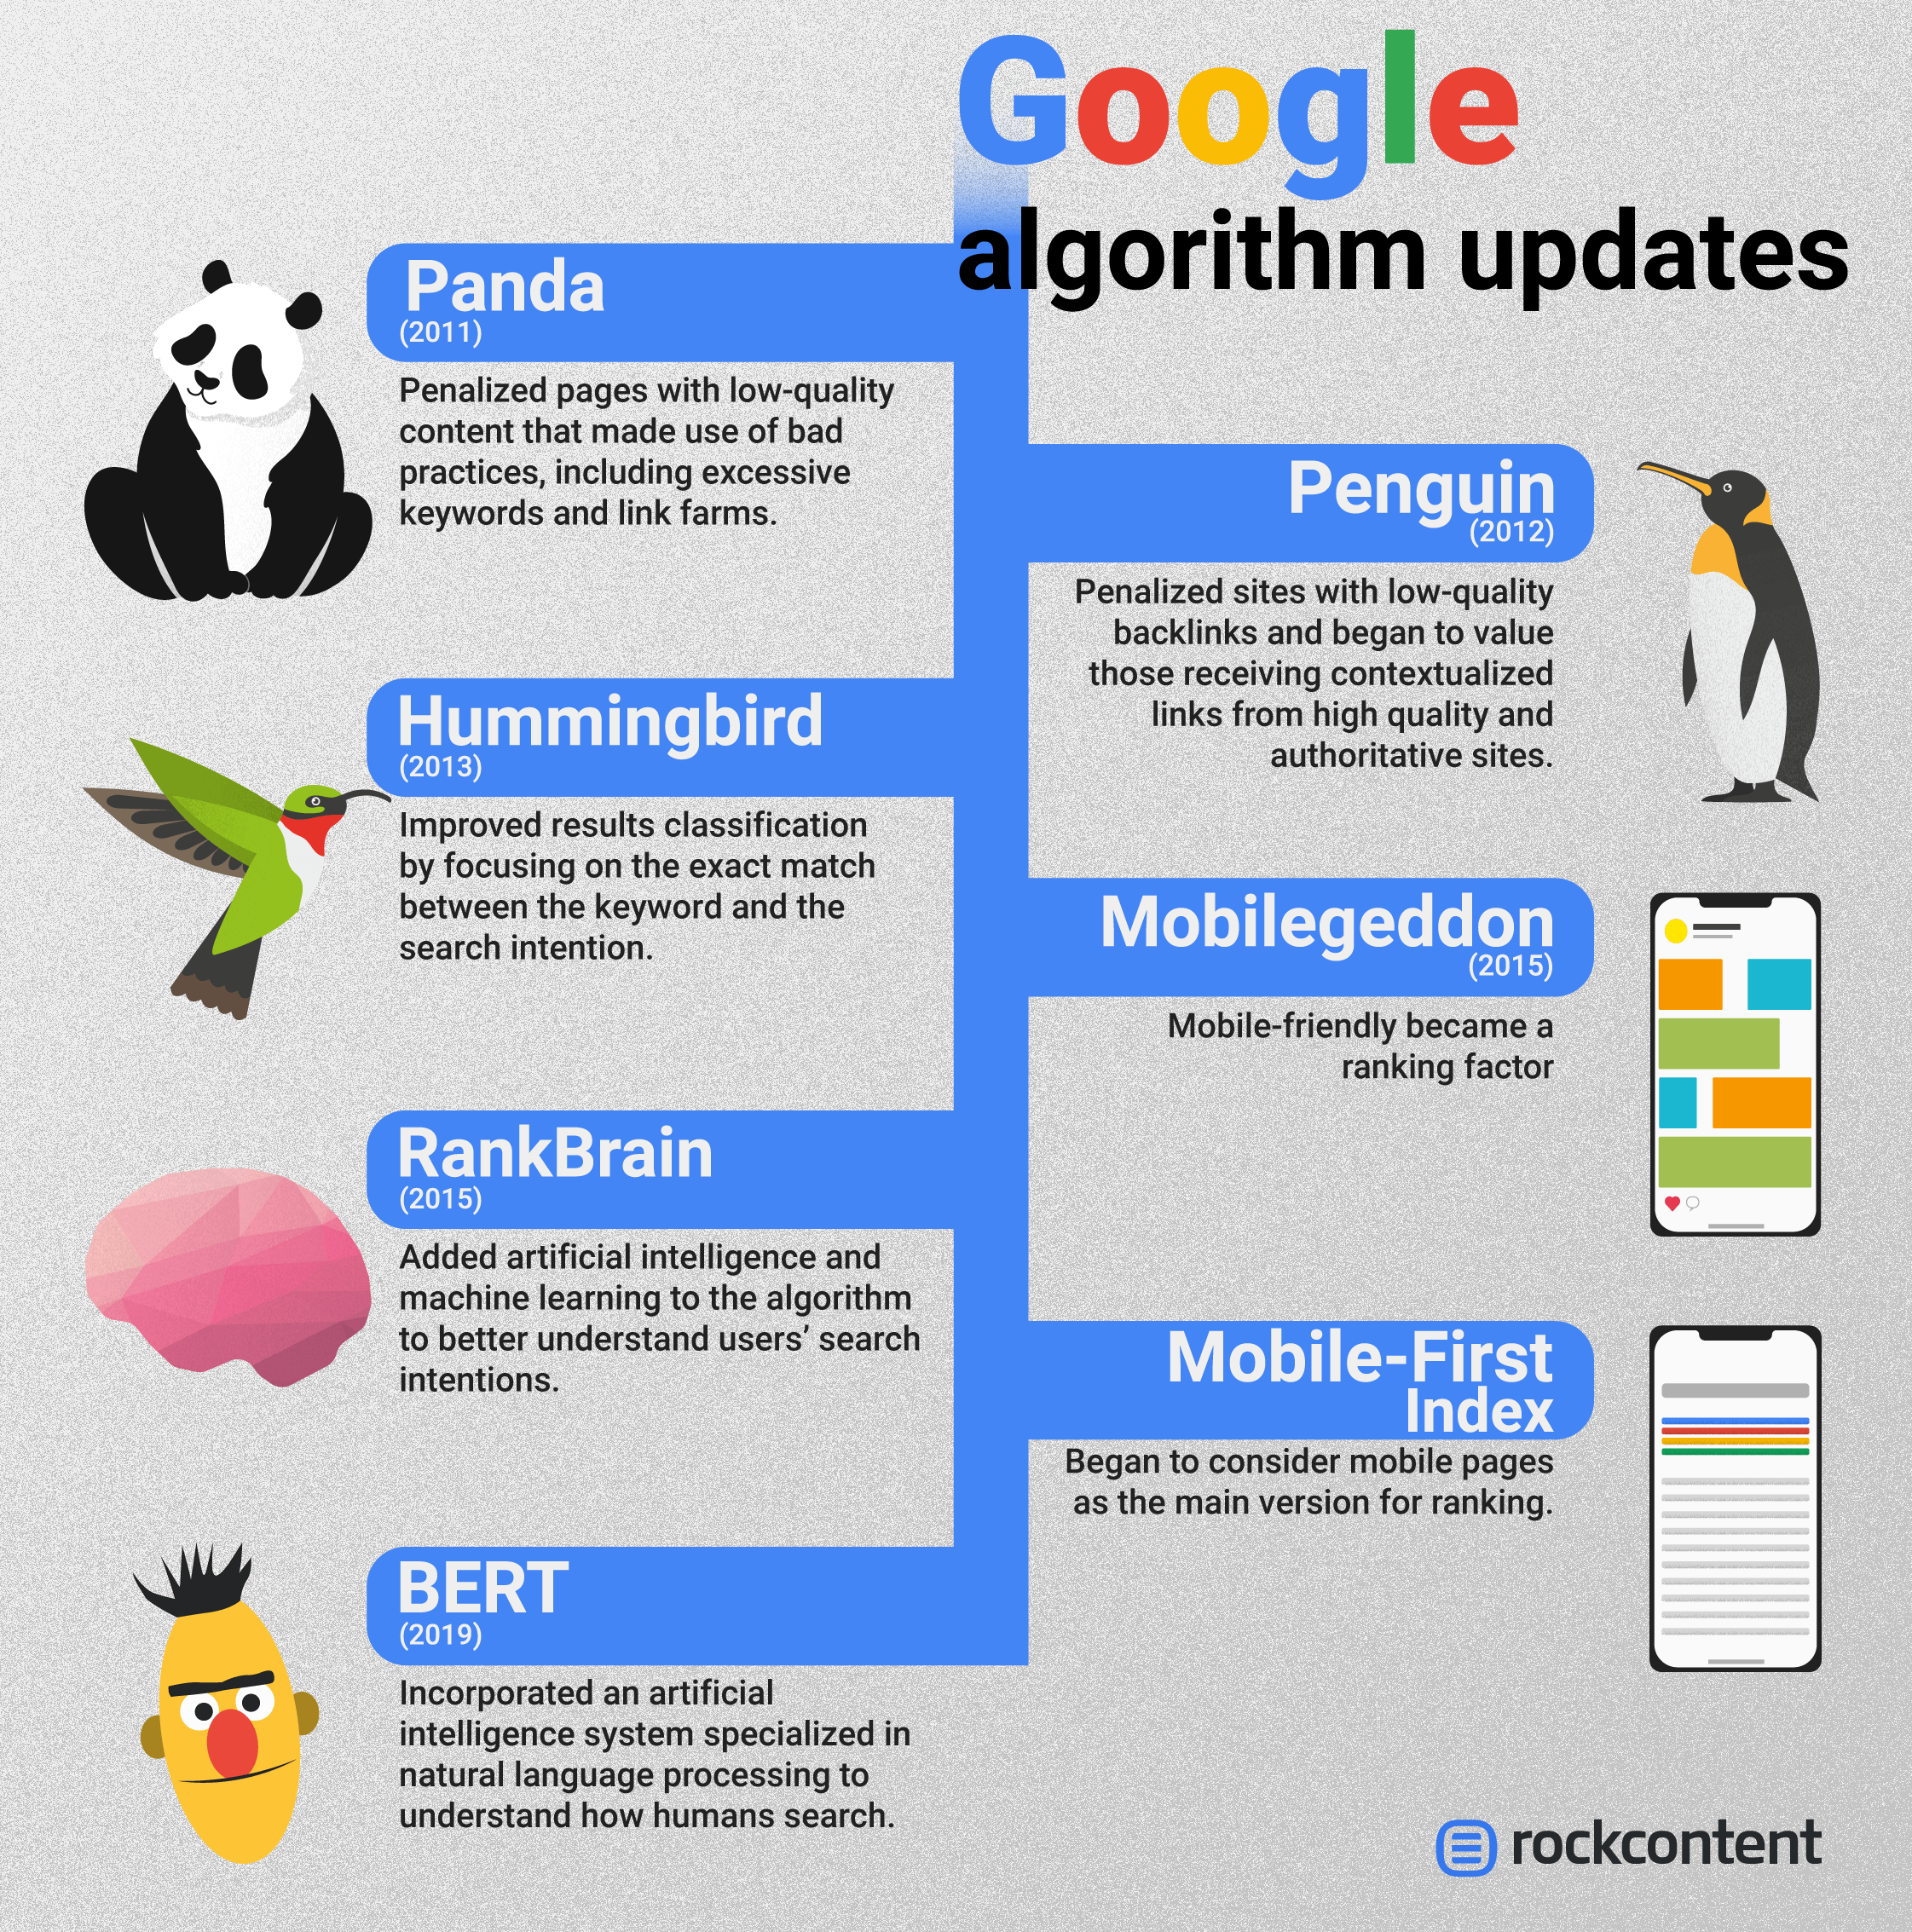 Google's algorithm and updates